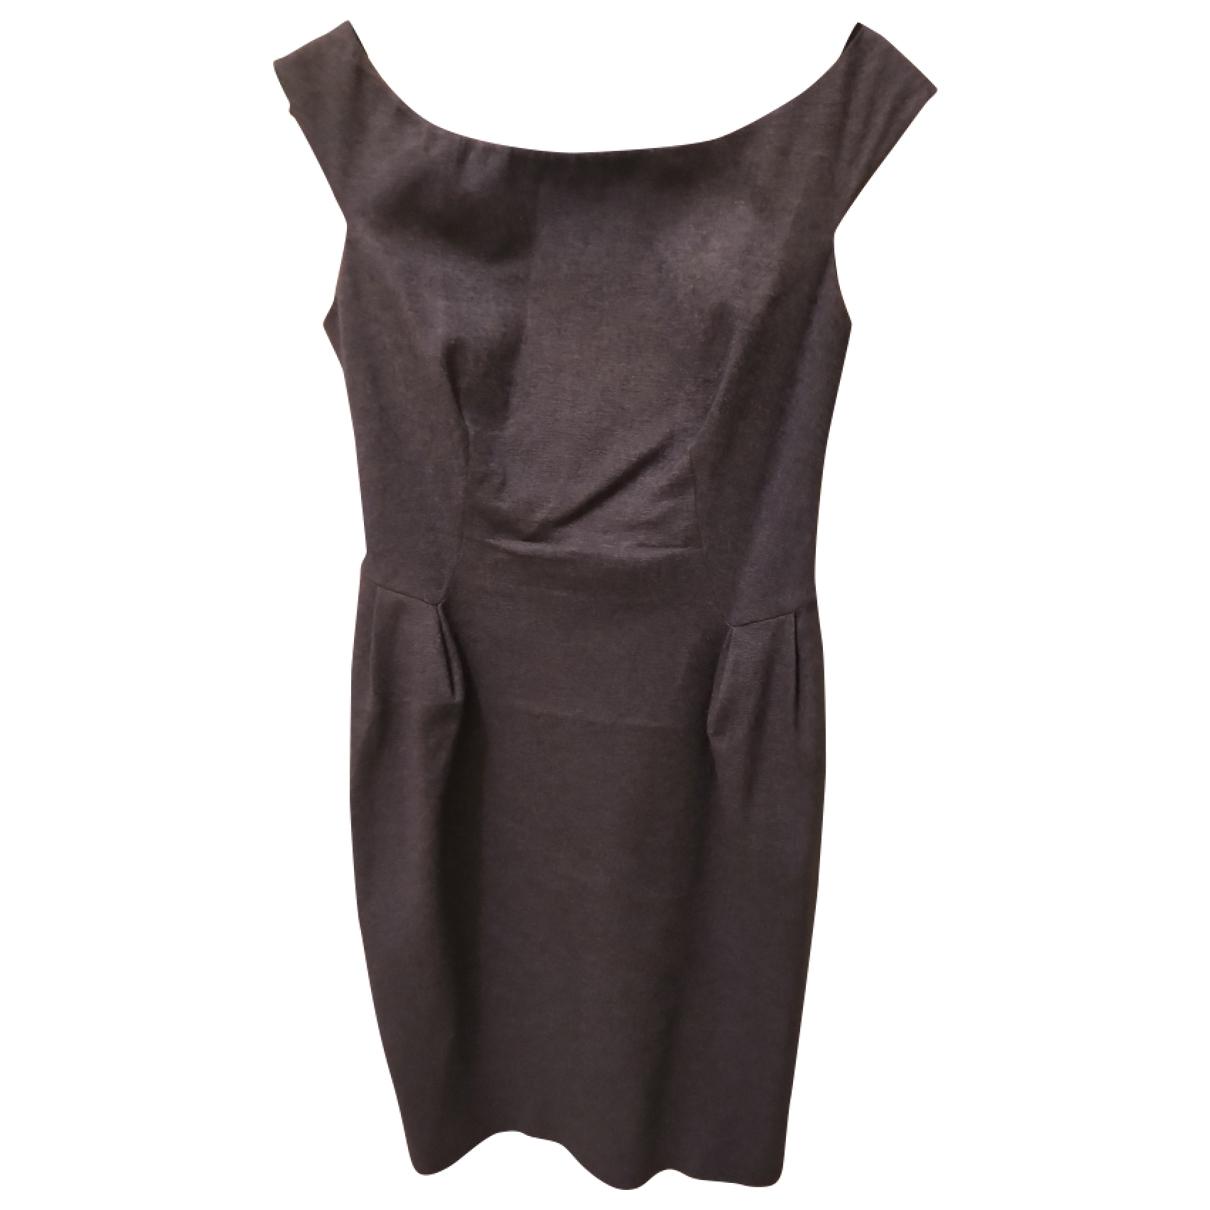 Ermanno Scervino \N Purple dress for Women 44 IT